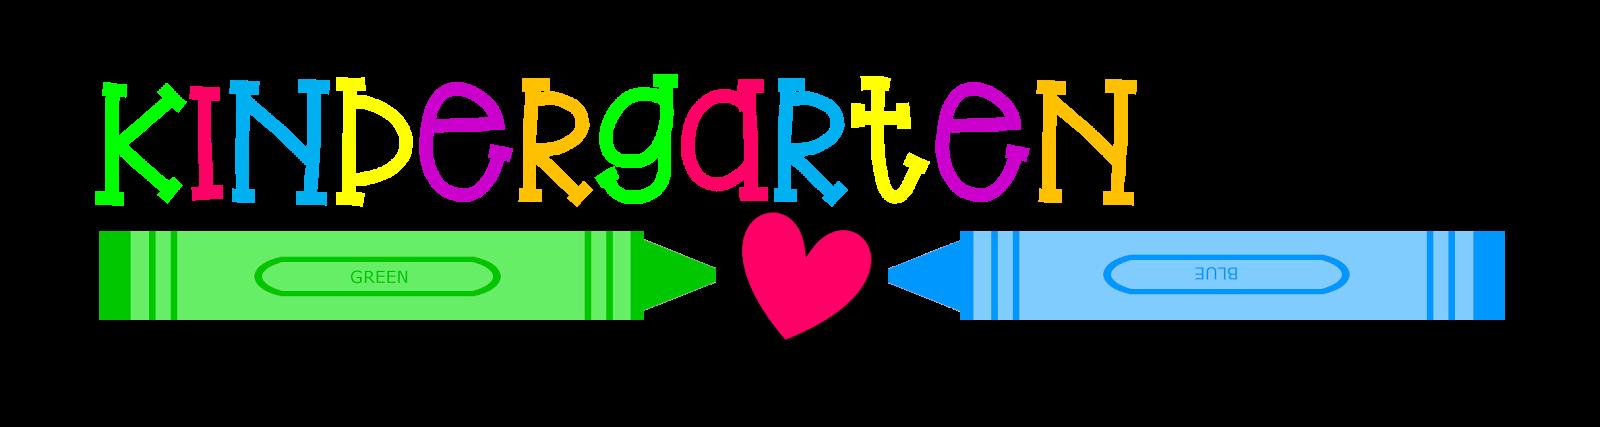 Kindergarten Katy